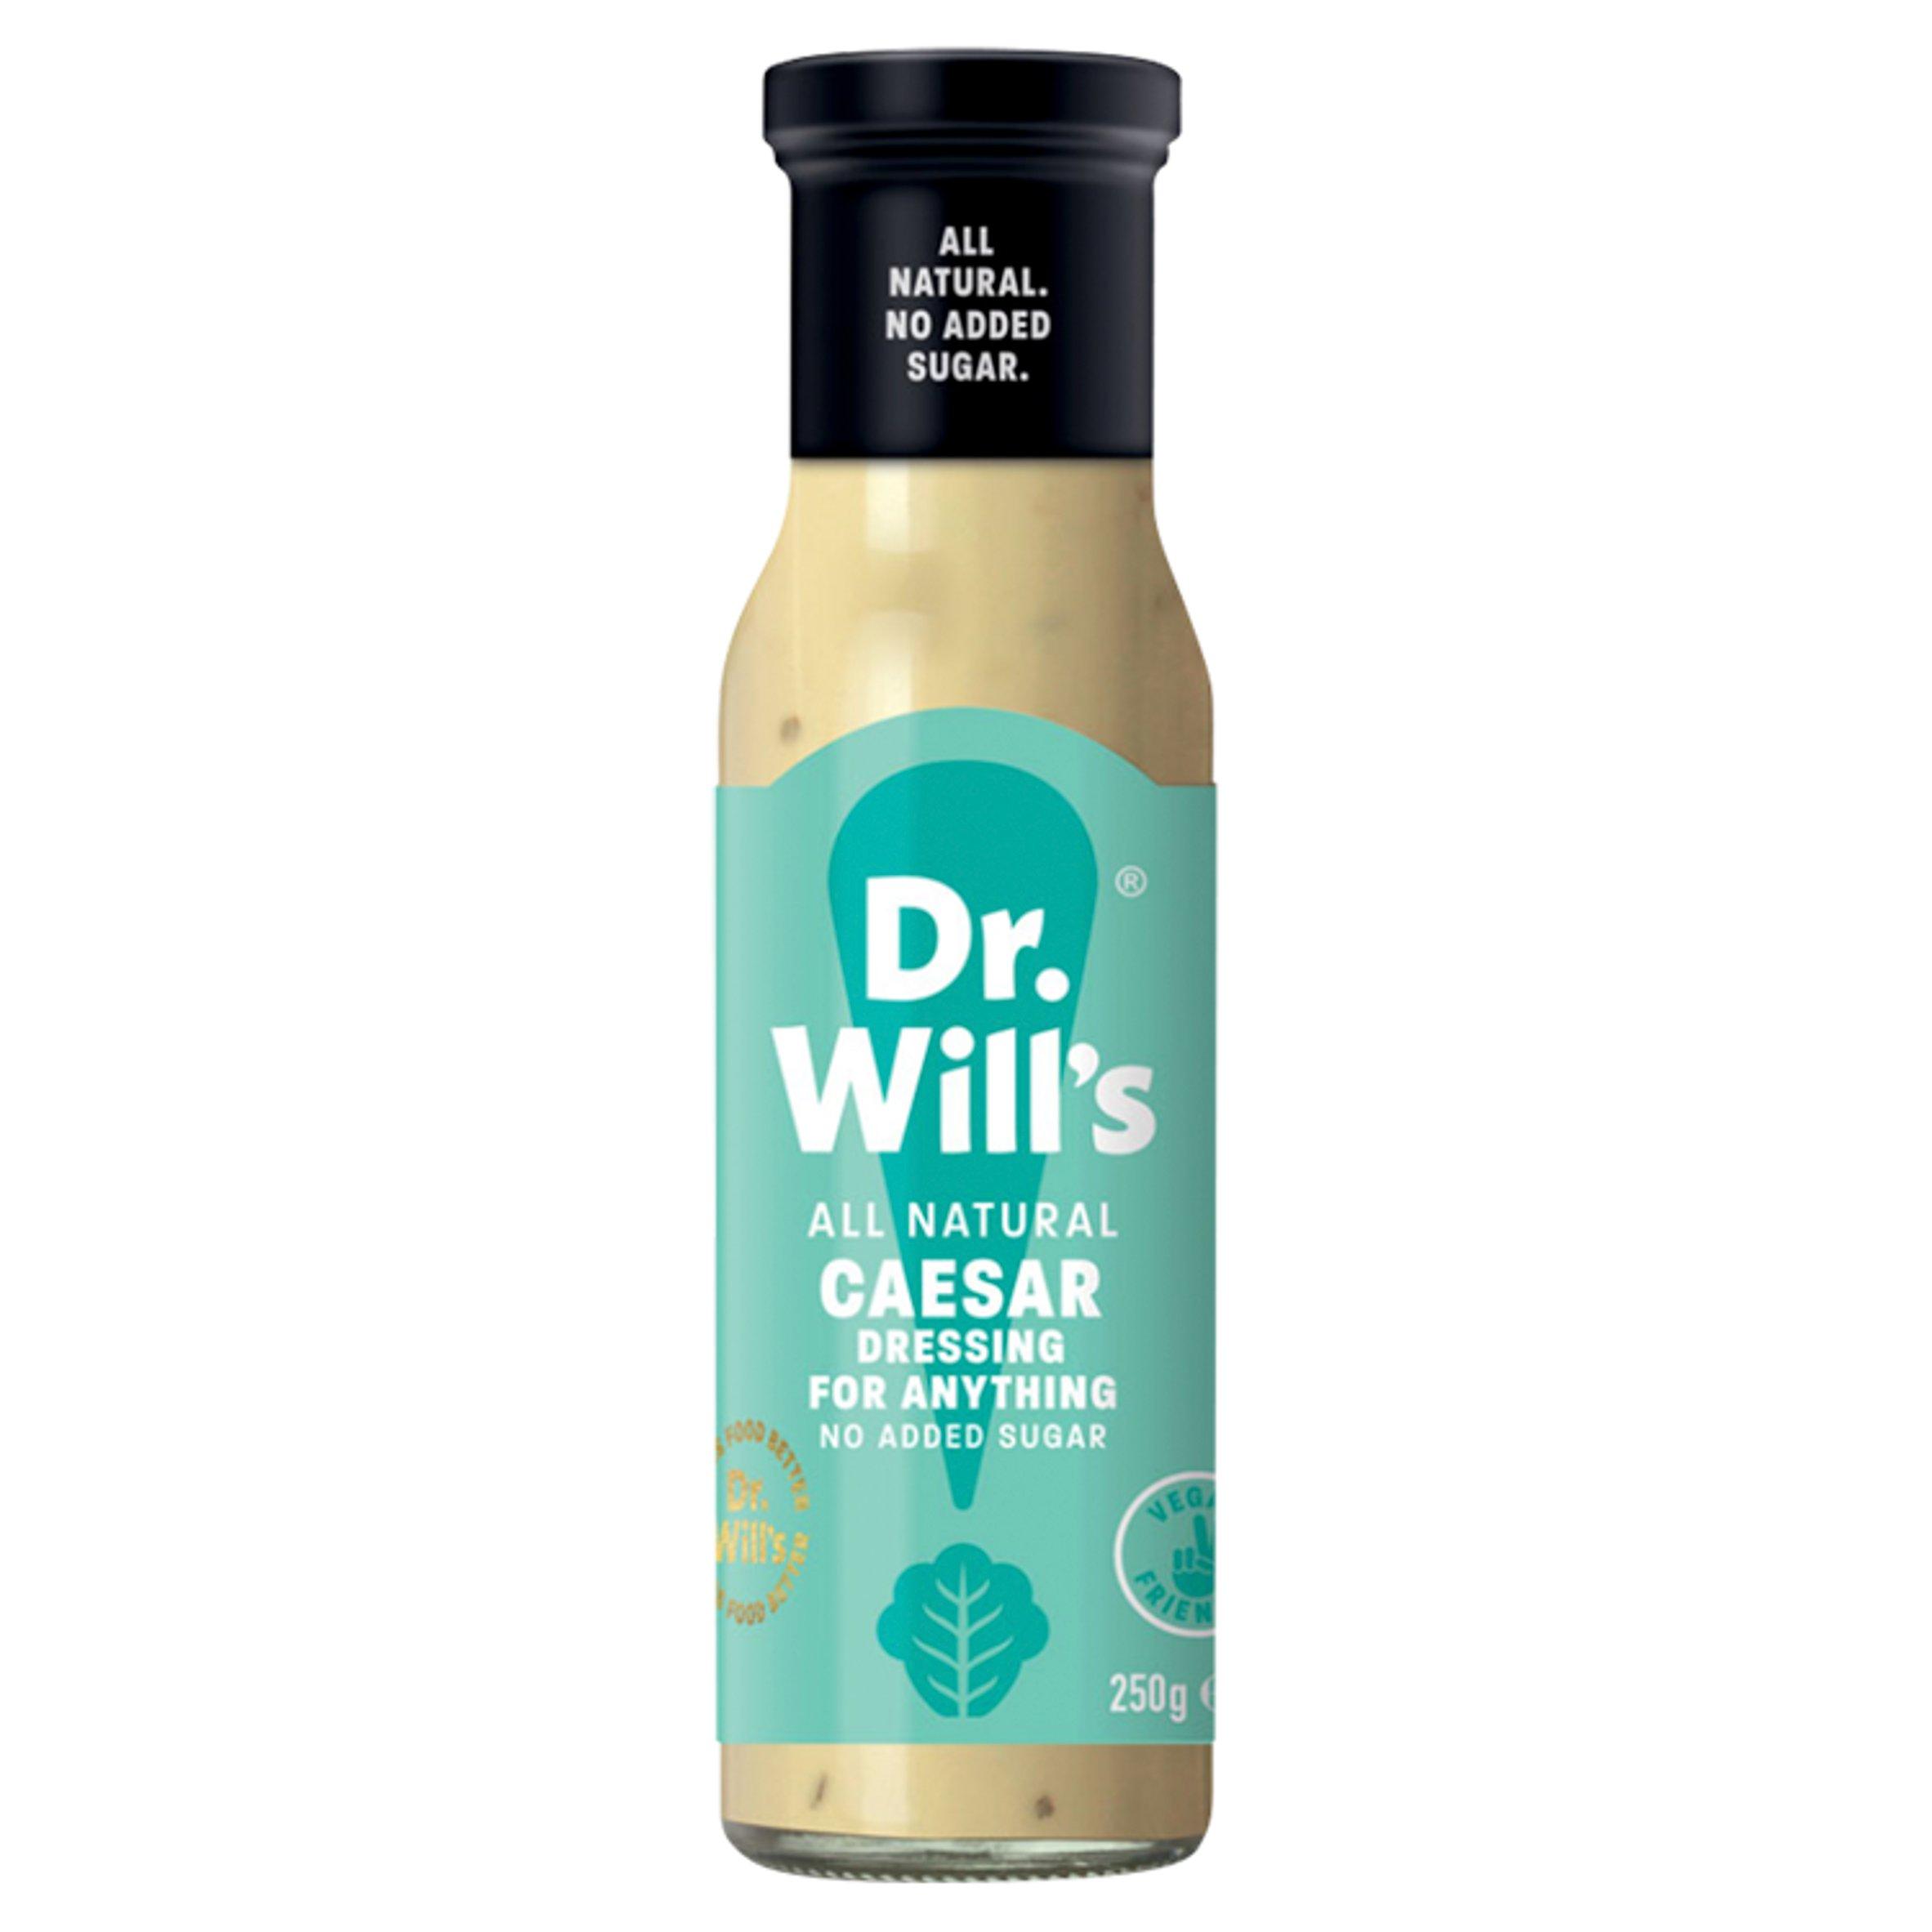 Dr. Will's Vegan Caesar Dressing 250G